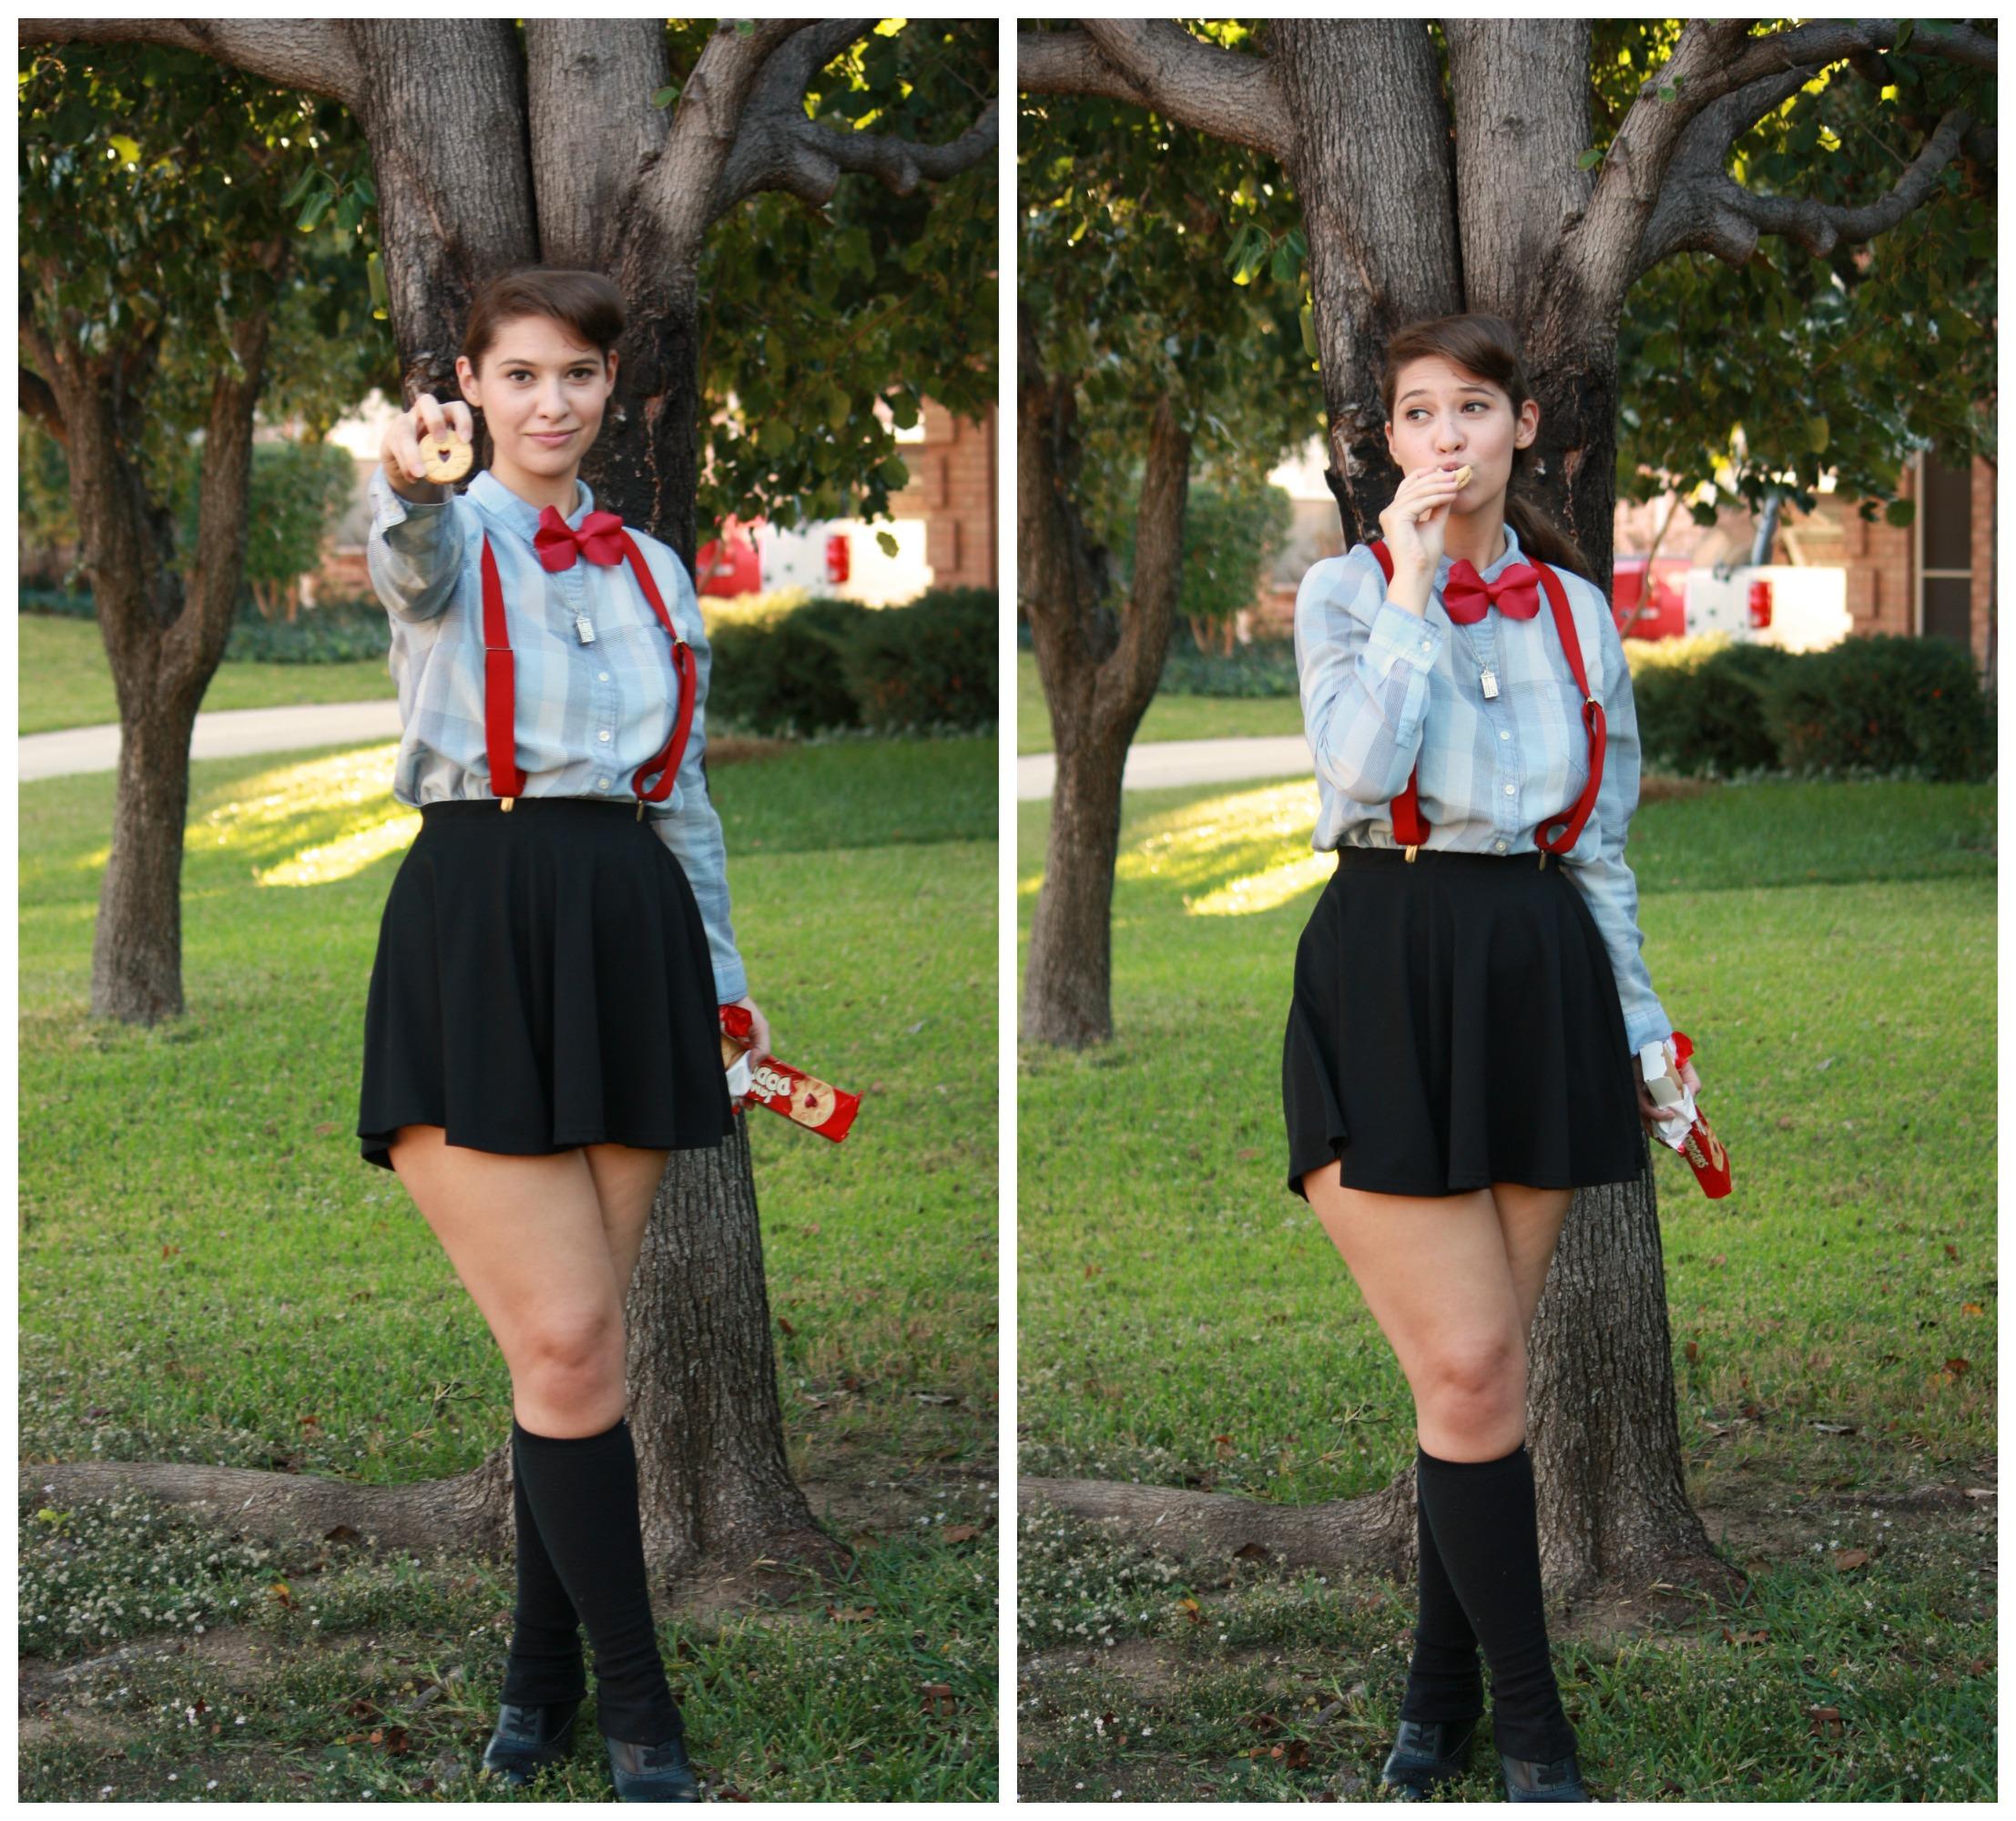 diy halloween costumes | sarah forshaw's blog